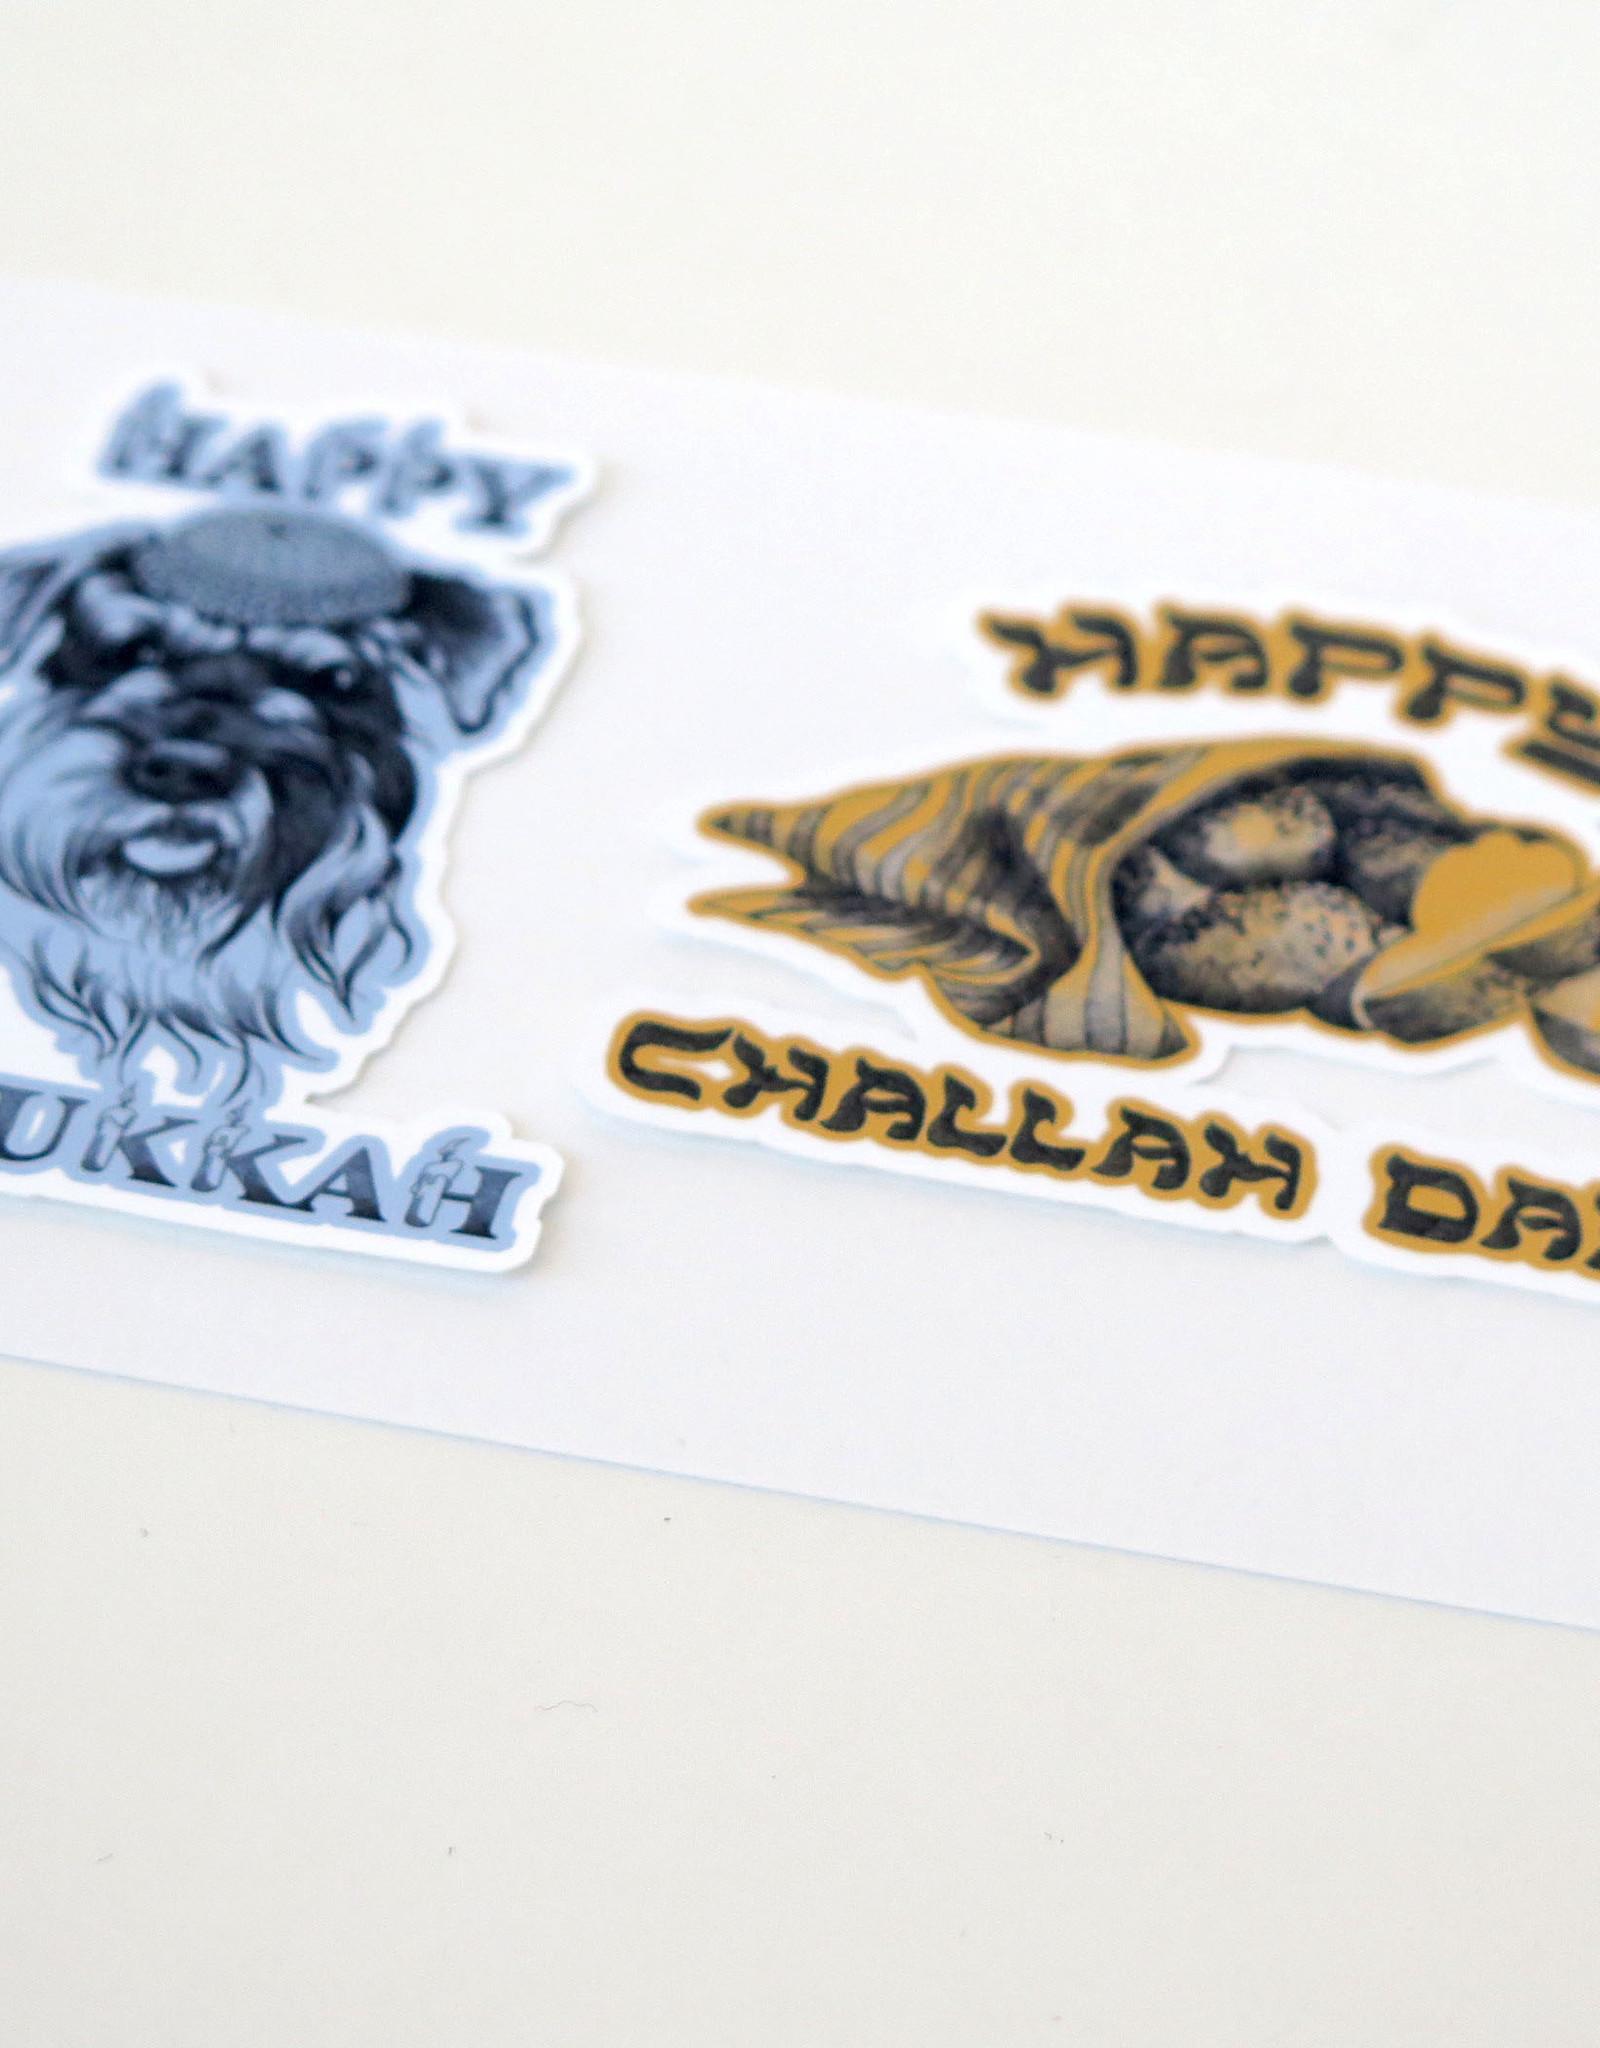 Hanukkah Sticker 2-Pack by Scott Dickens, All4Pun